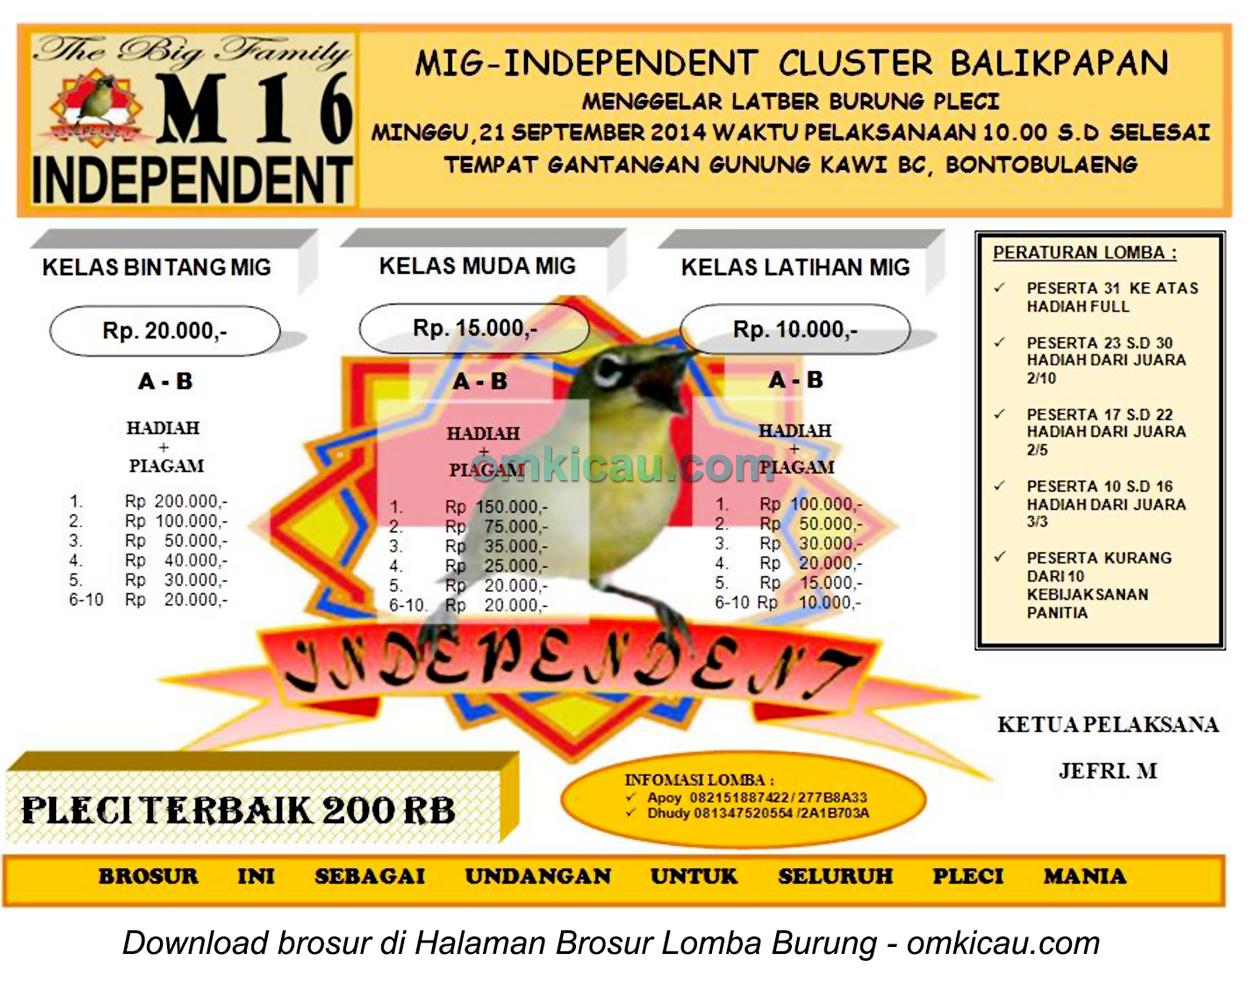 Brosur Lomba Burung Pleci MIG Independent, Balikpapan, 21 September 2014